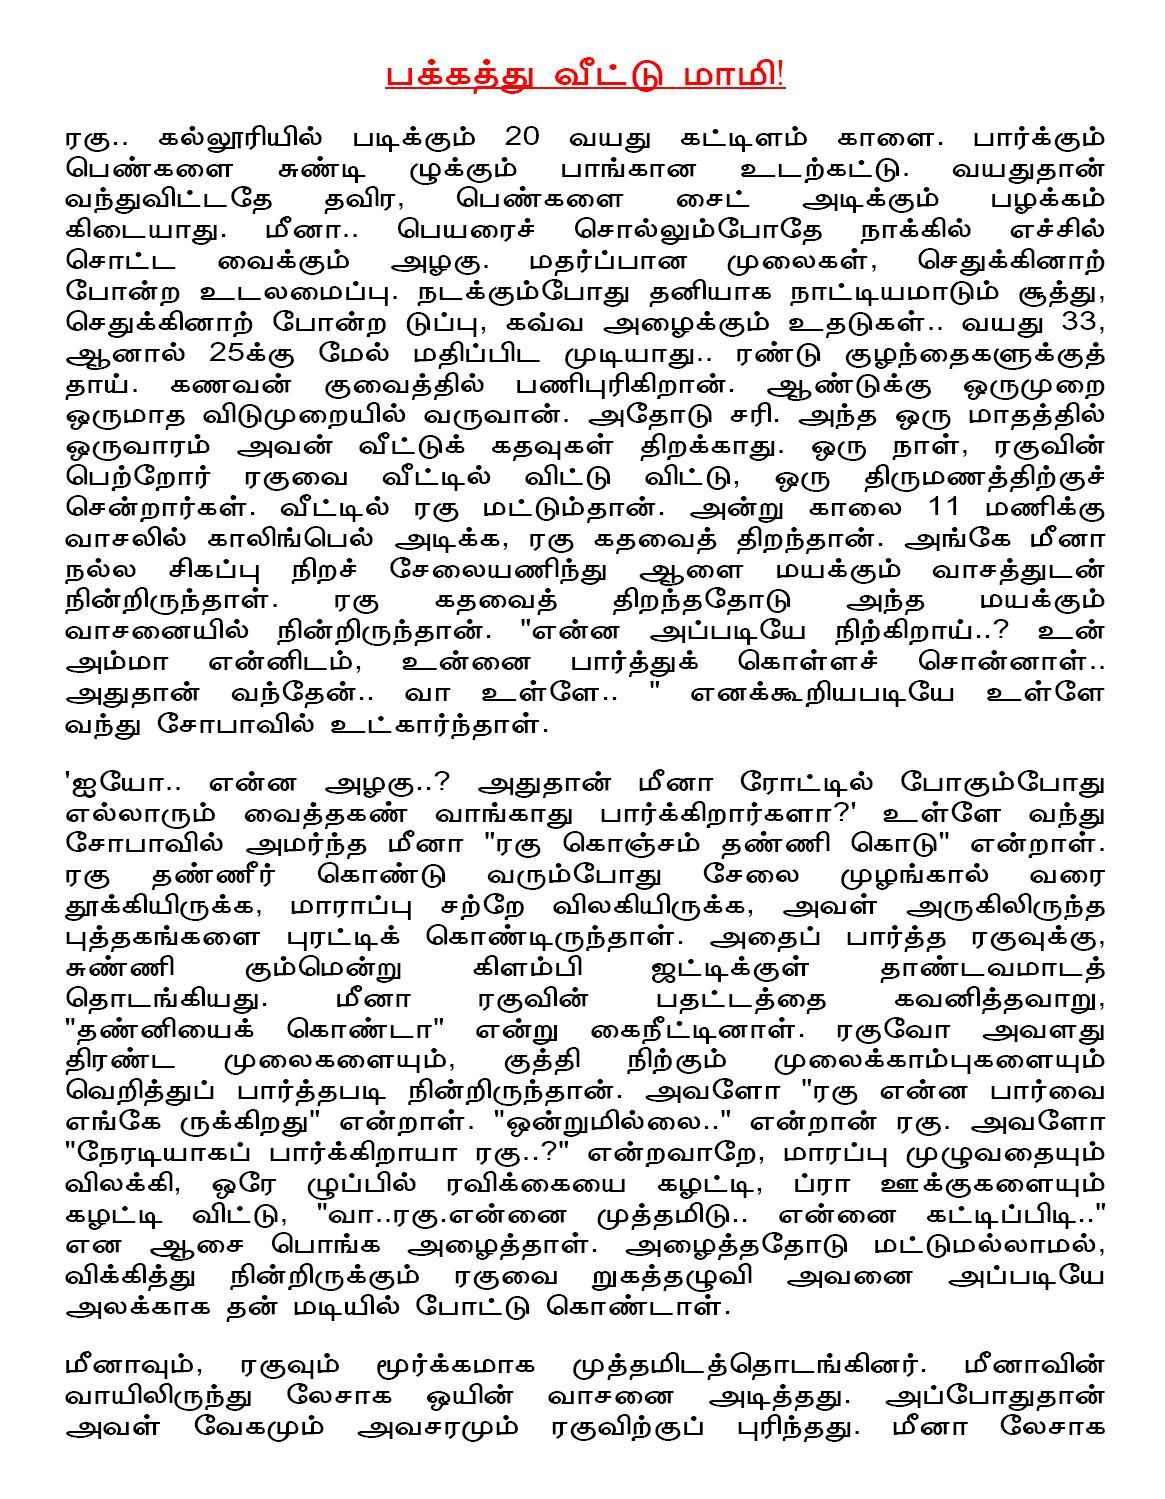 Tamil Pengal Amma Magan Sex - Adult Circum-8888